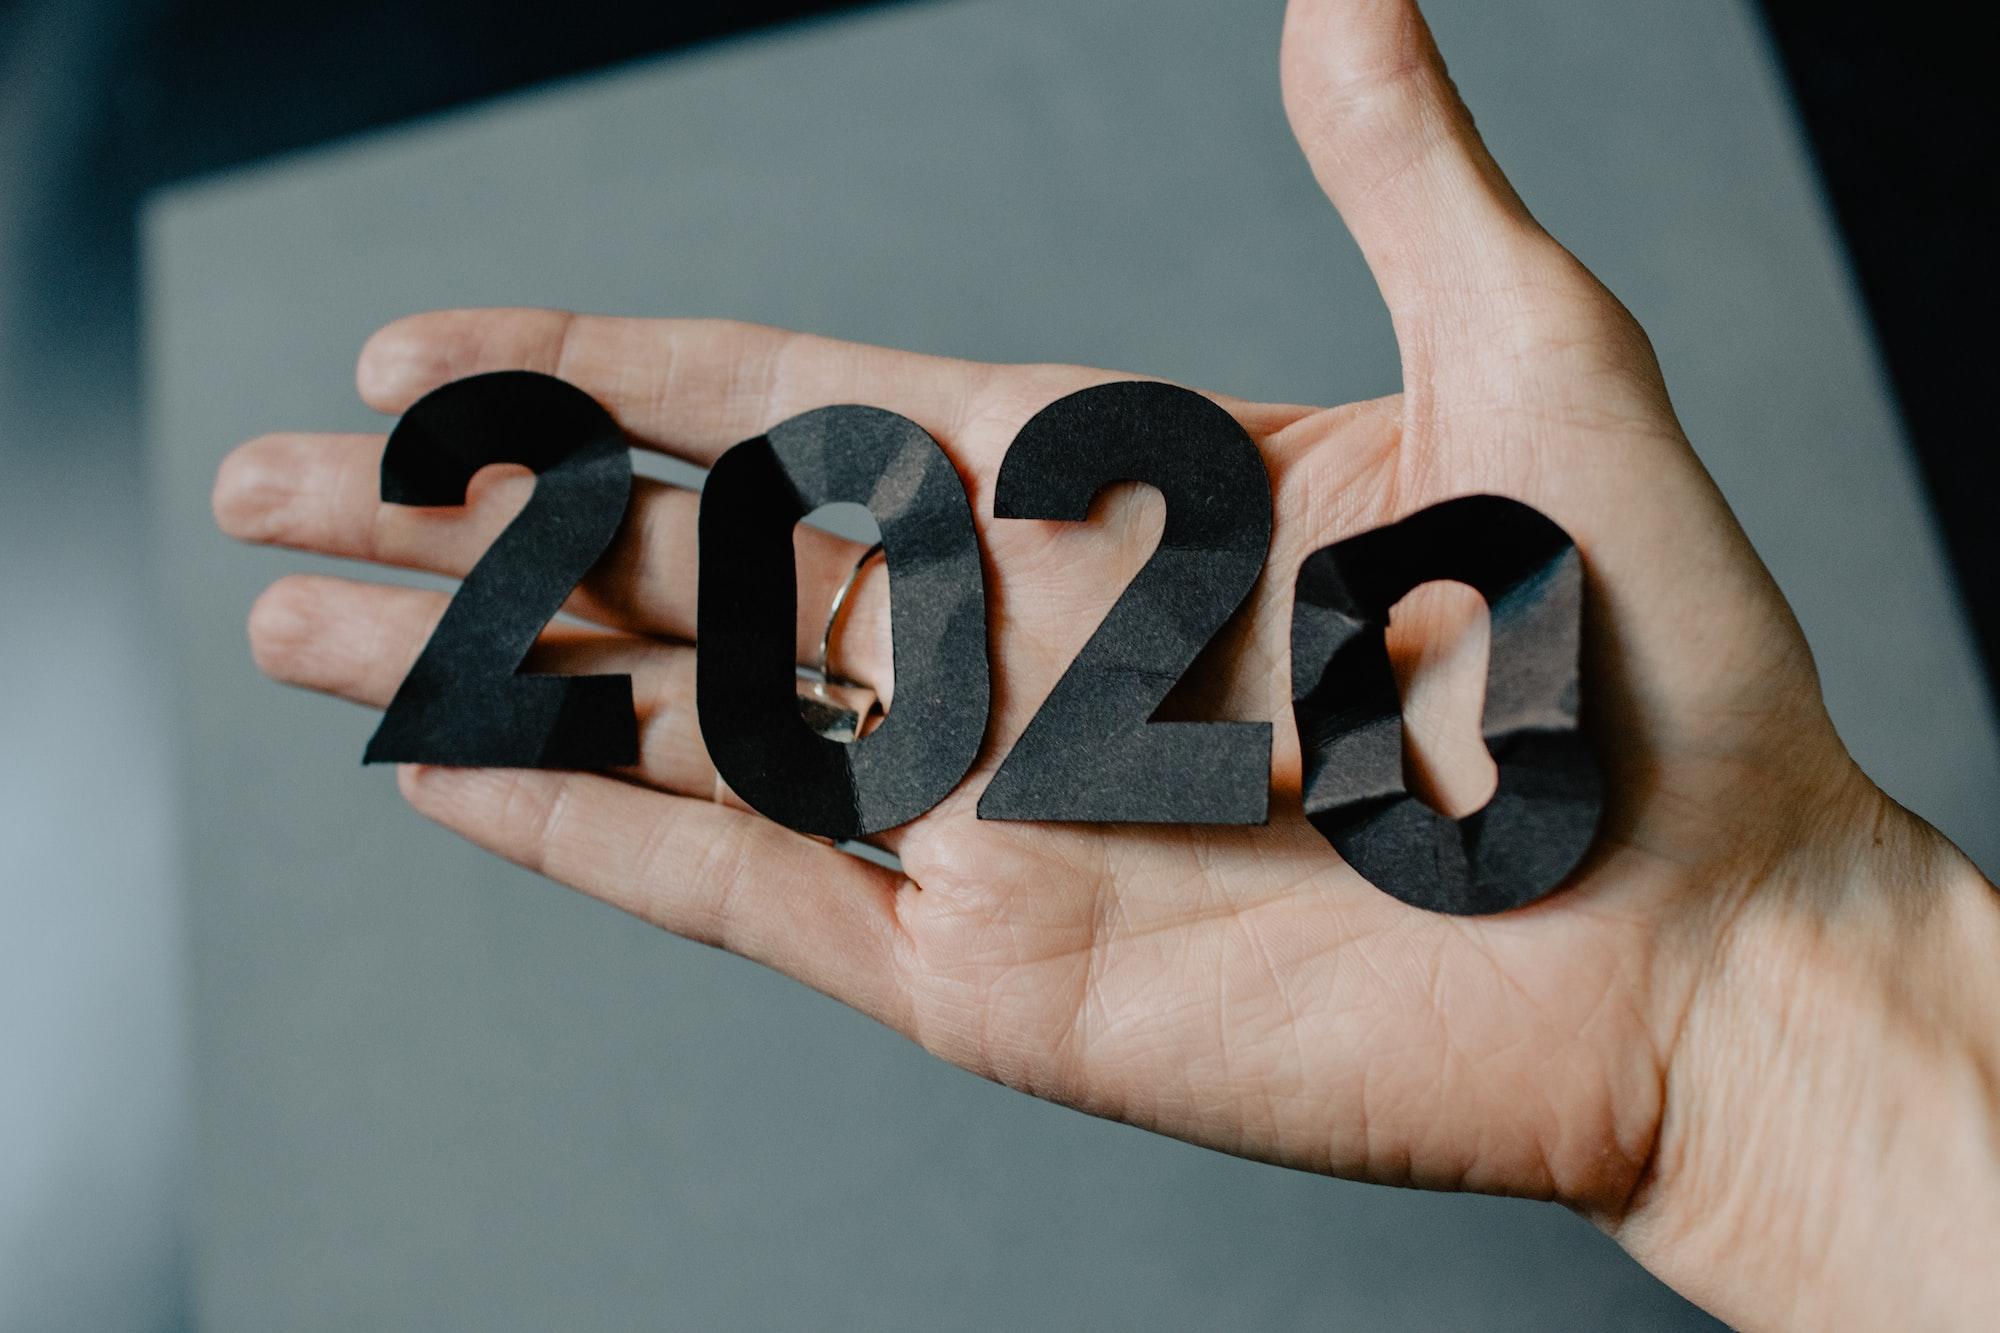 2020 thus far